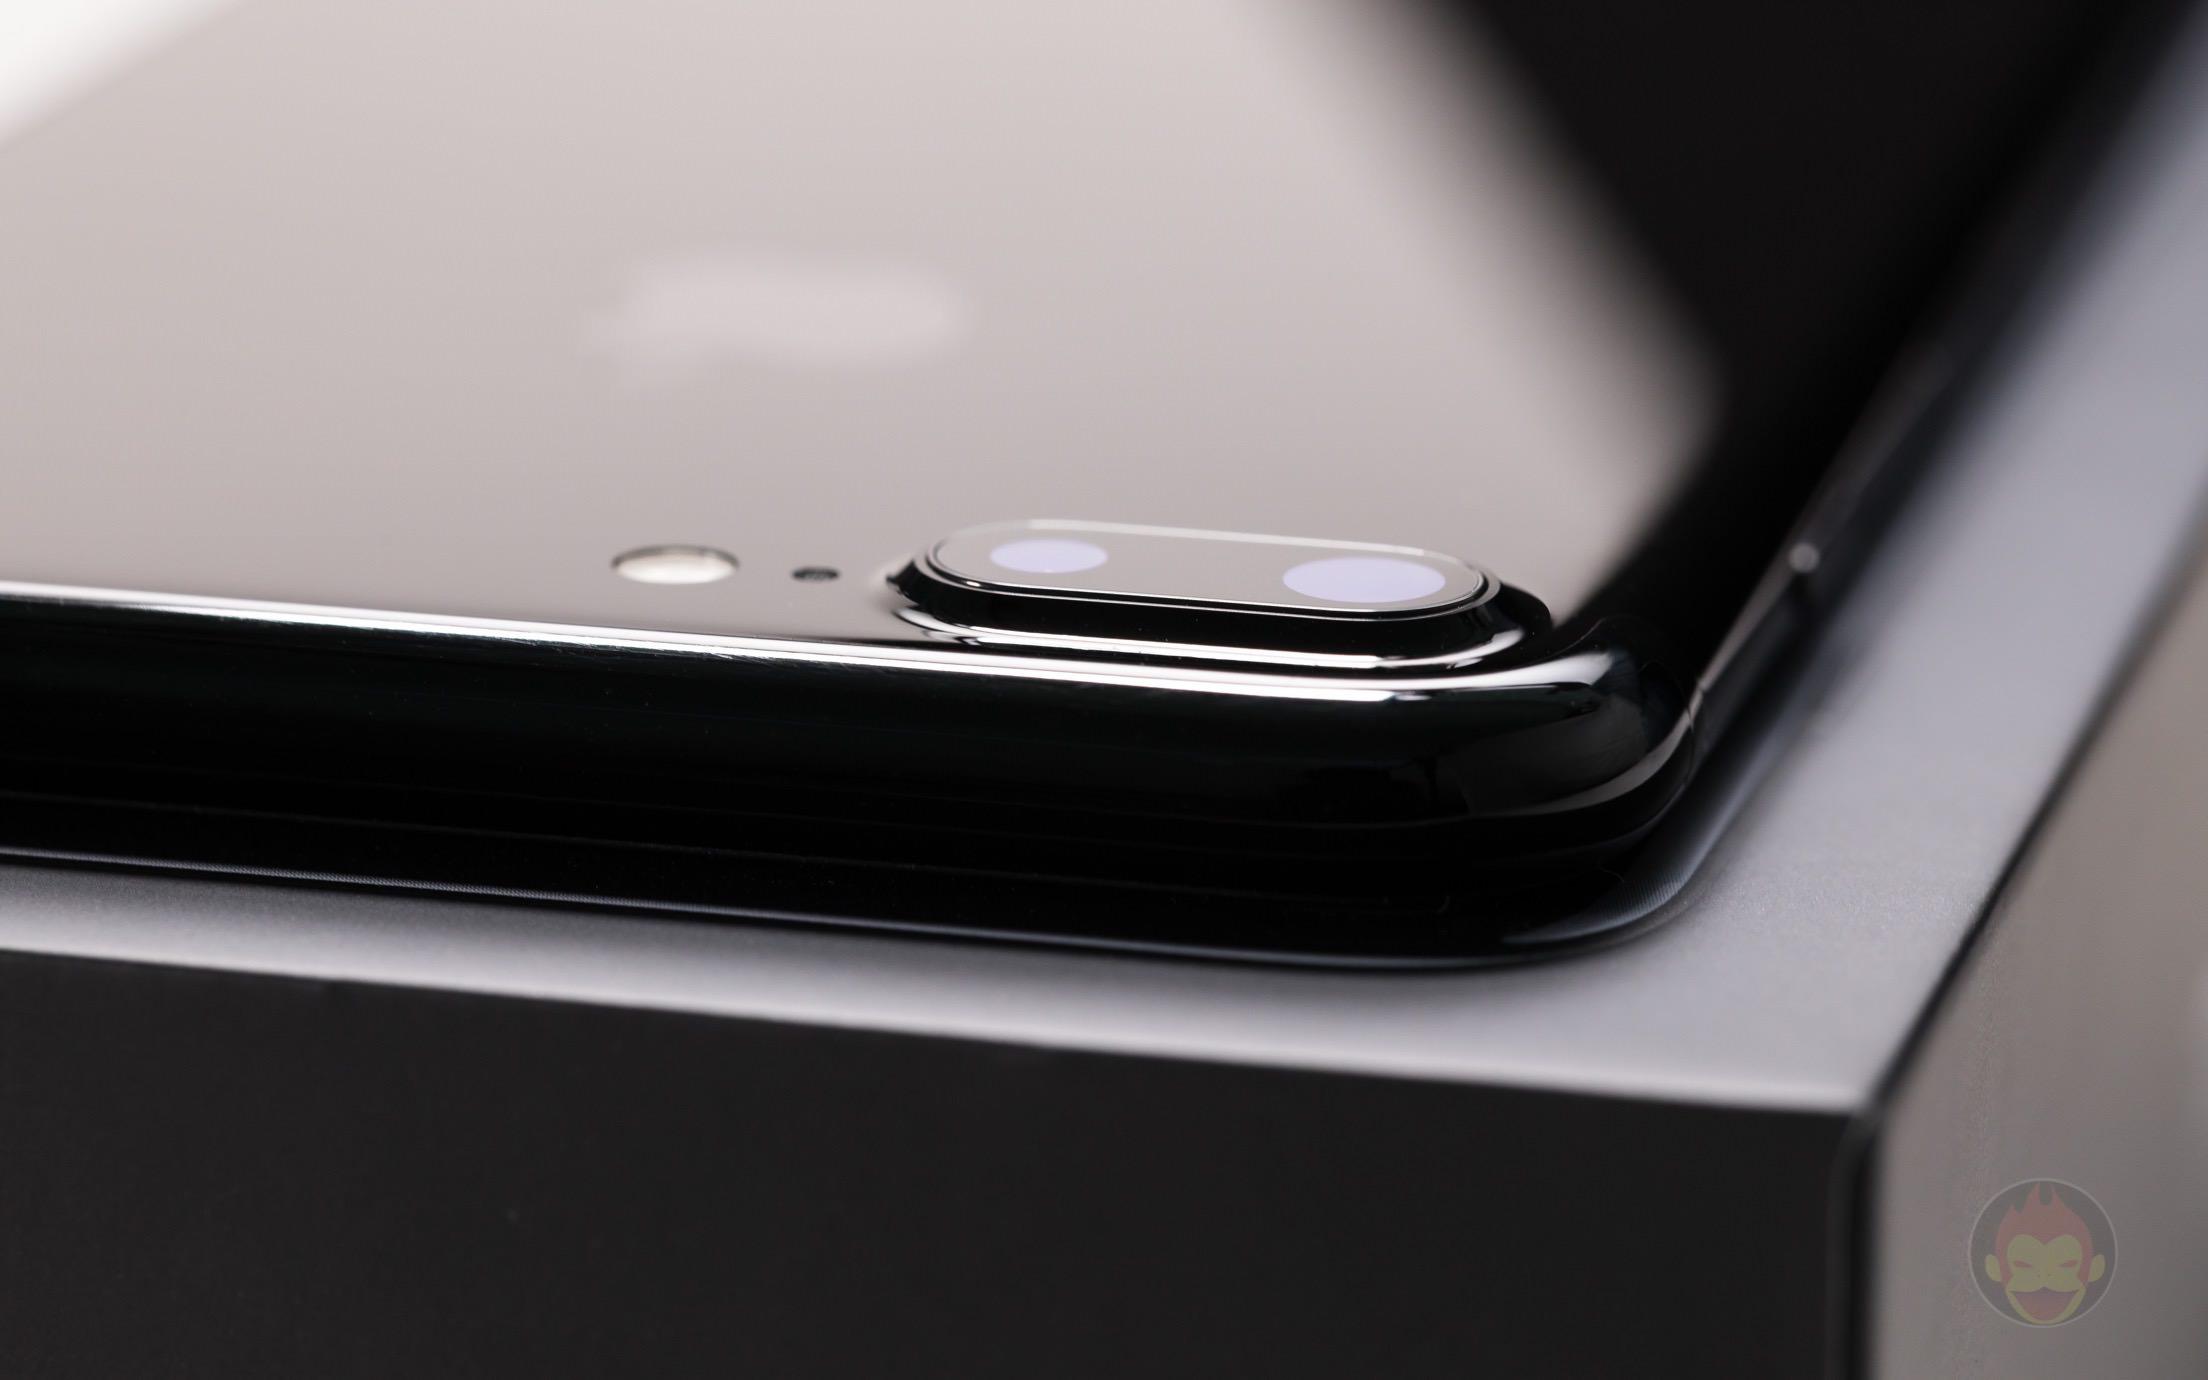 iPhone-7-Plus-Dual-Lens-Camera-01.jpg